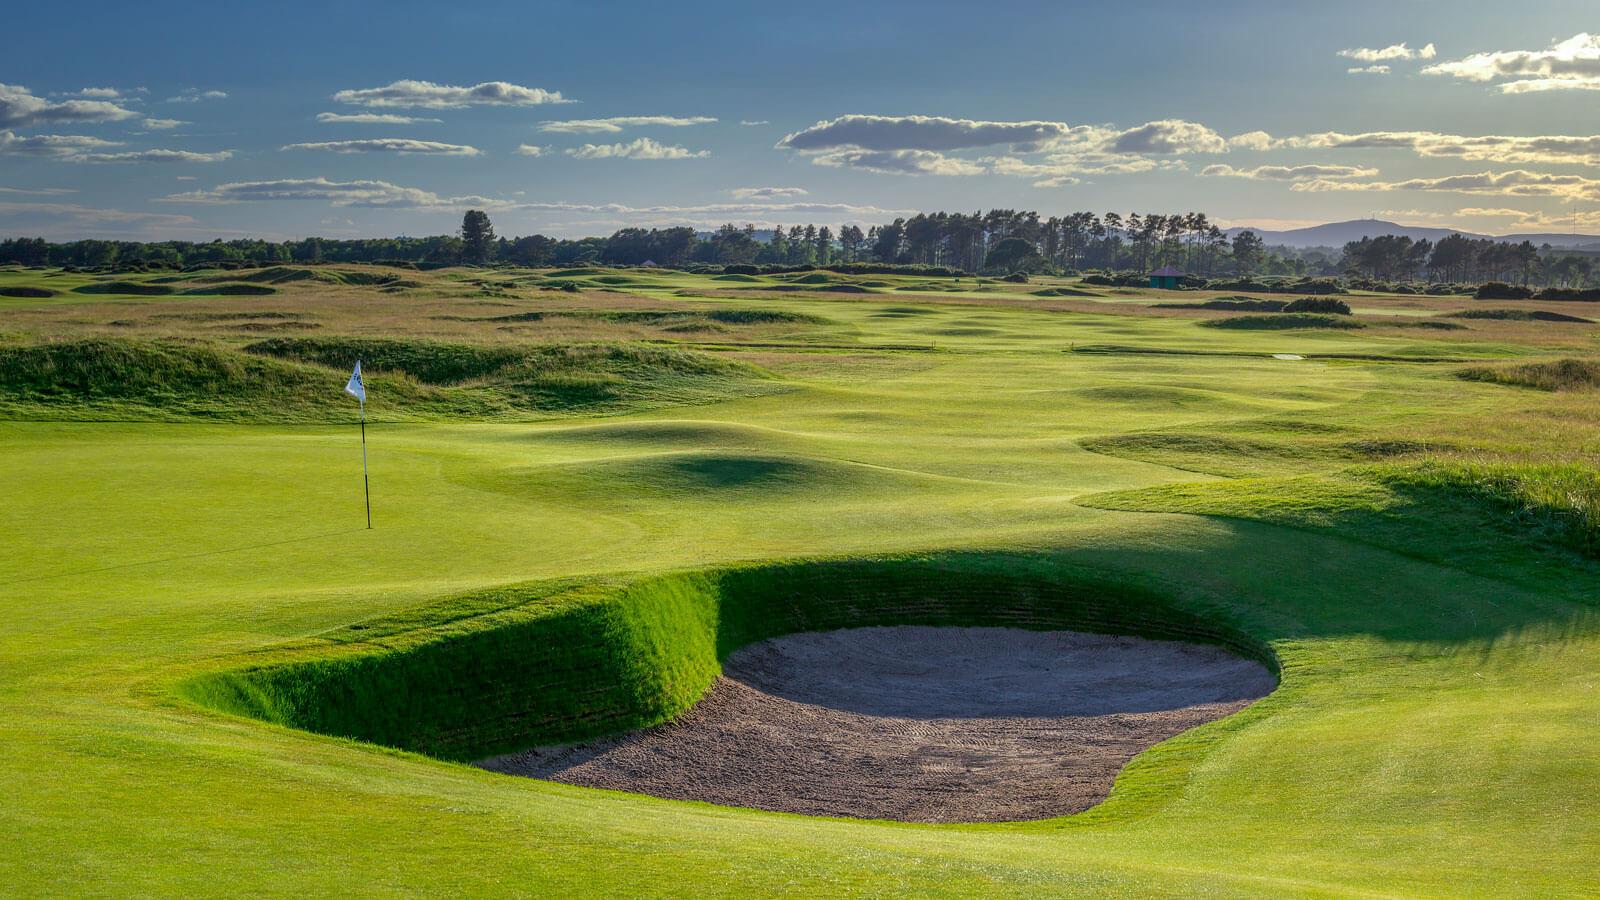 golf carnoustie course scotland championship courses links around golfscape scottish golfers travel features visitscotland